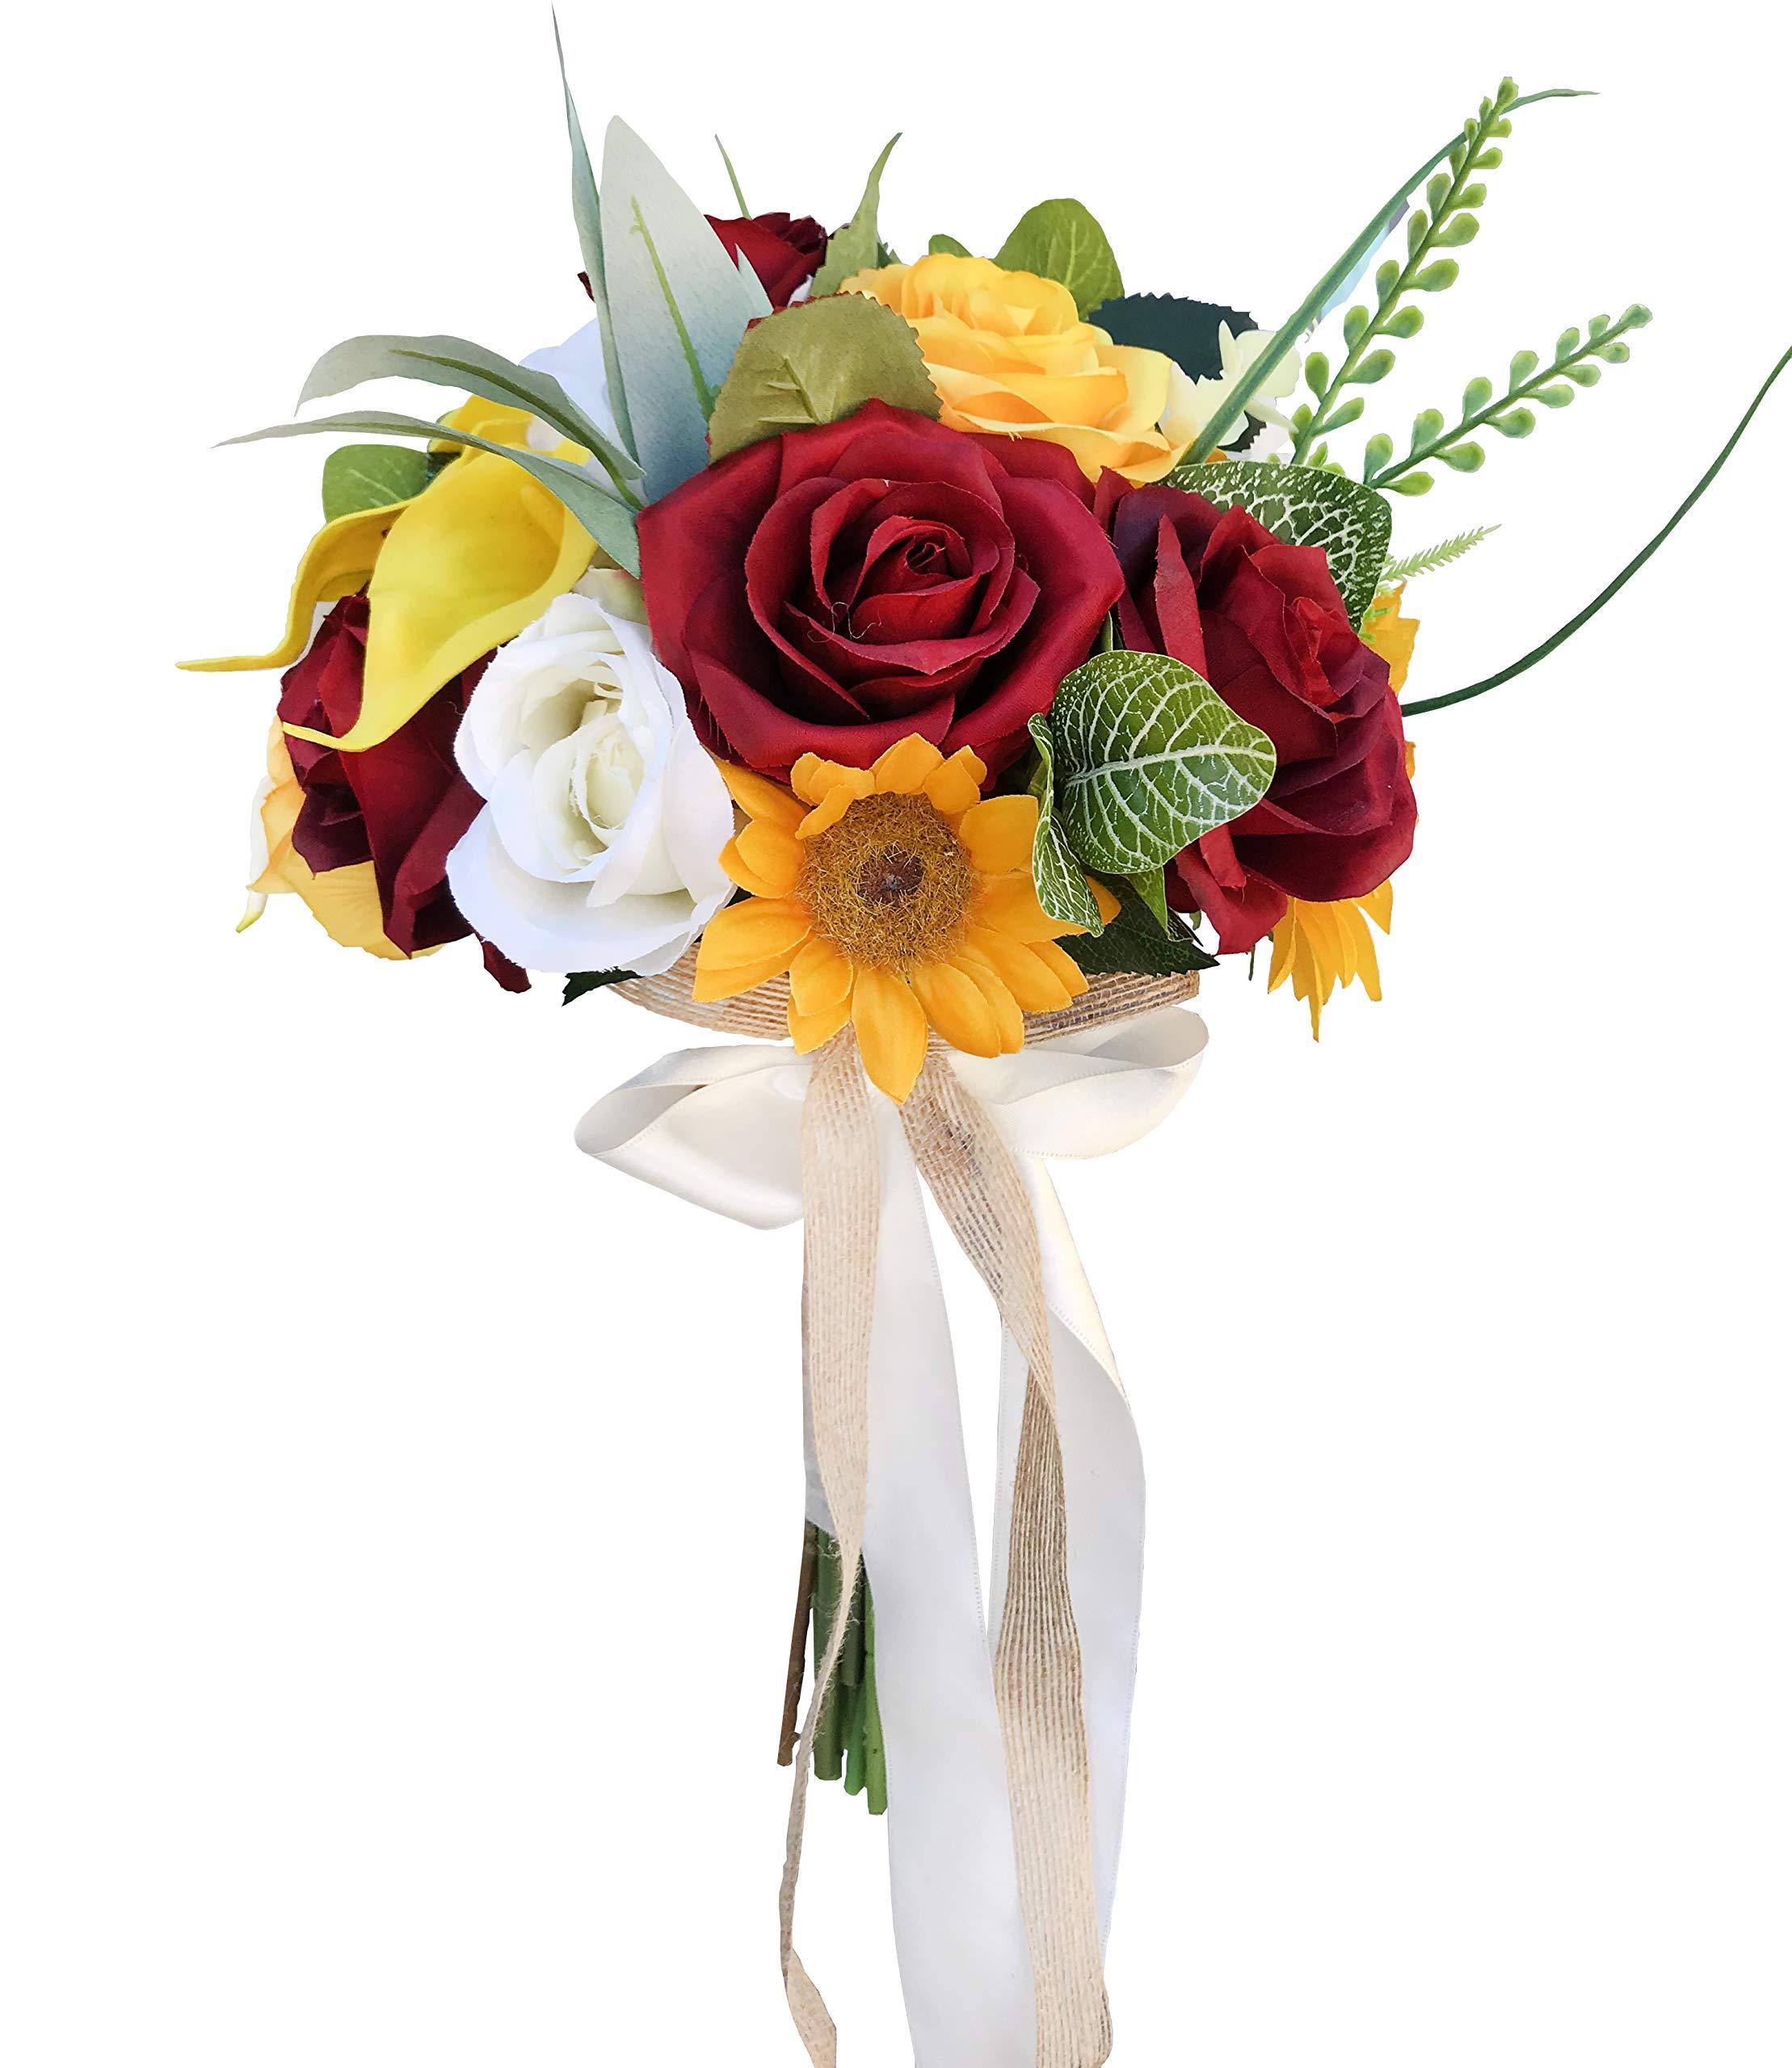 Dalamoda Holding Flowers Sunflower Bouquet Artificial Silk Flowers Fake Rose For Wedding Party Valentine S Day Pack 1 Silk Flower Arrangements